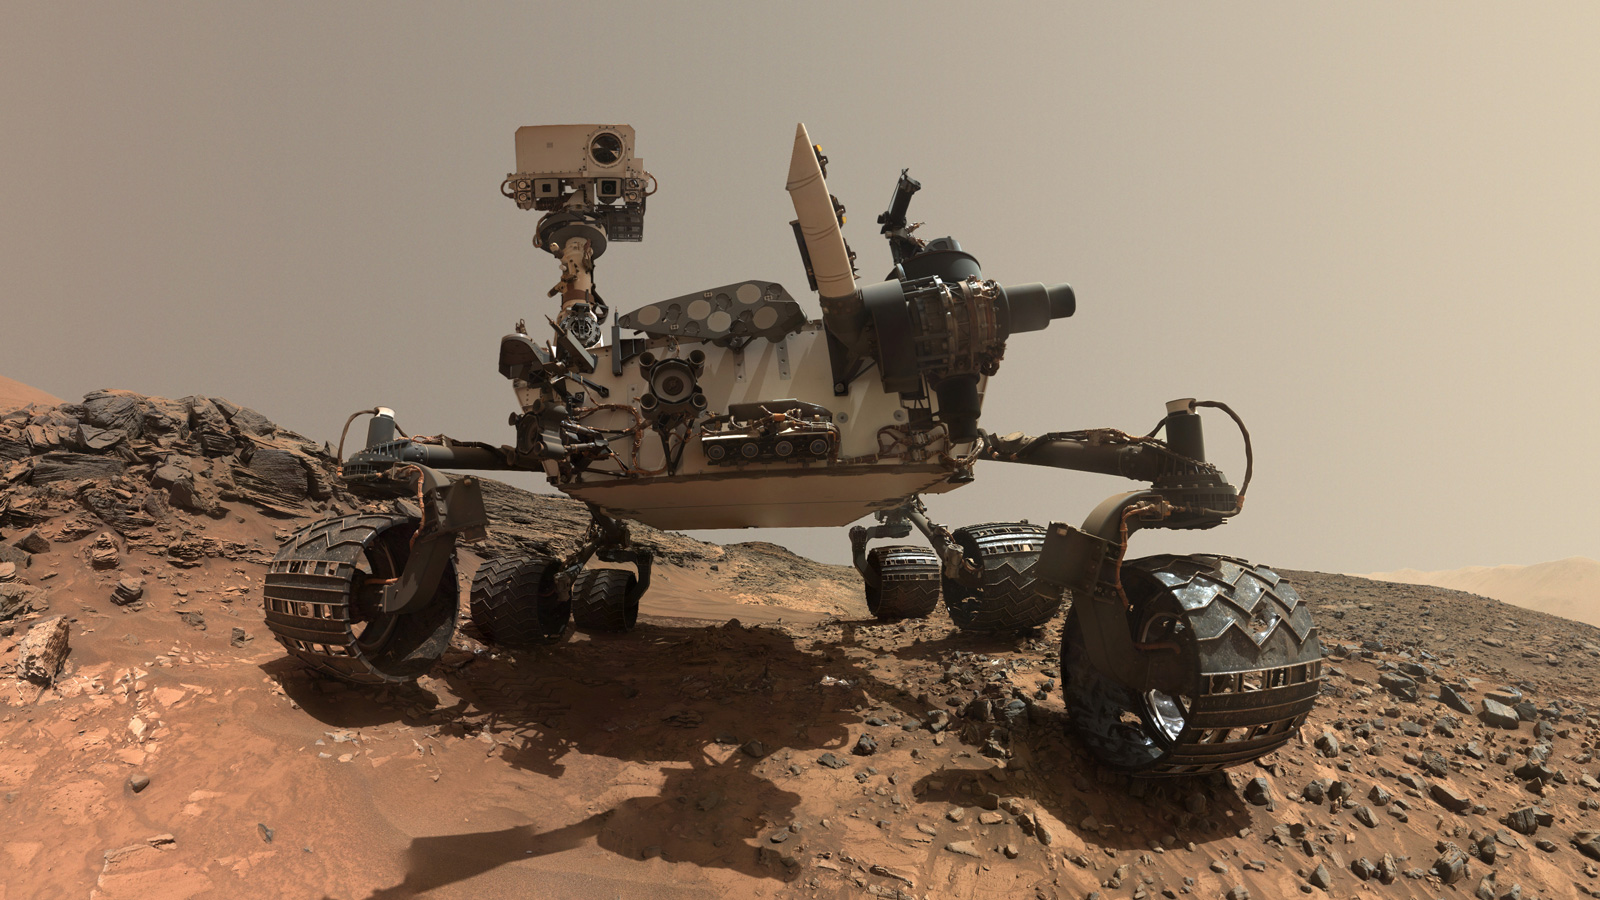 Home   Curiosity – NASA's Mars Exploration Program